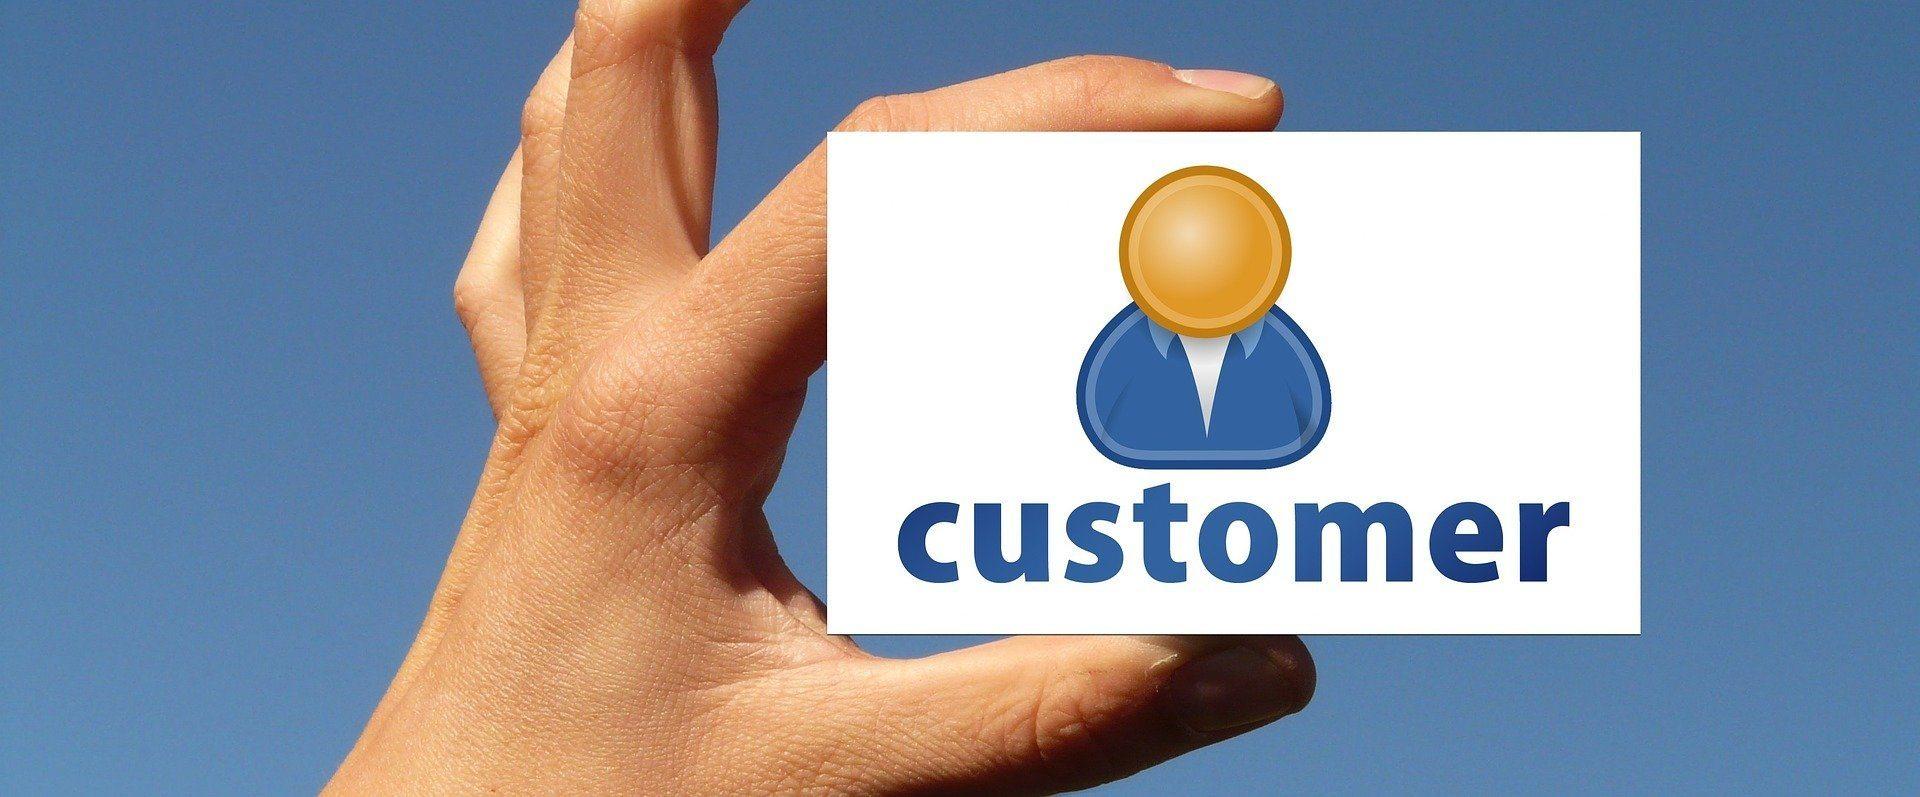 customer avatar - How to Create a Customer Avatar or Persona